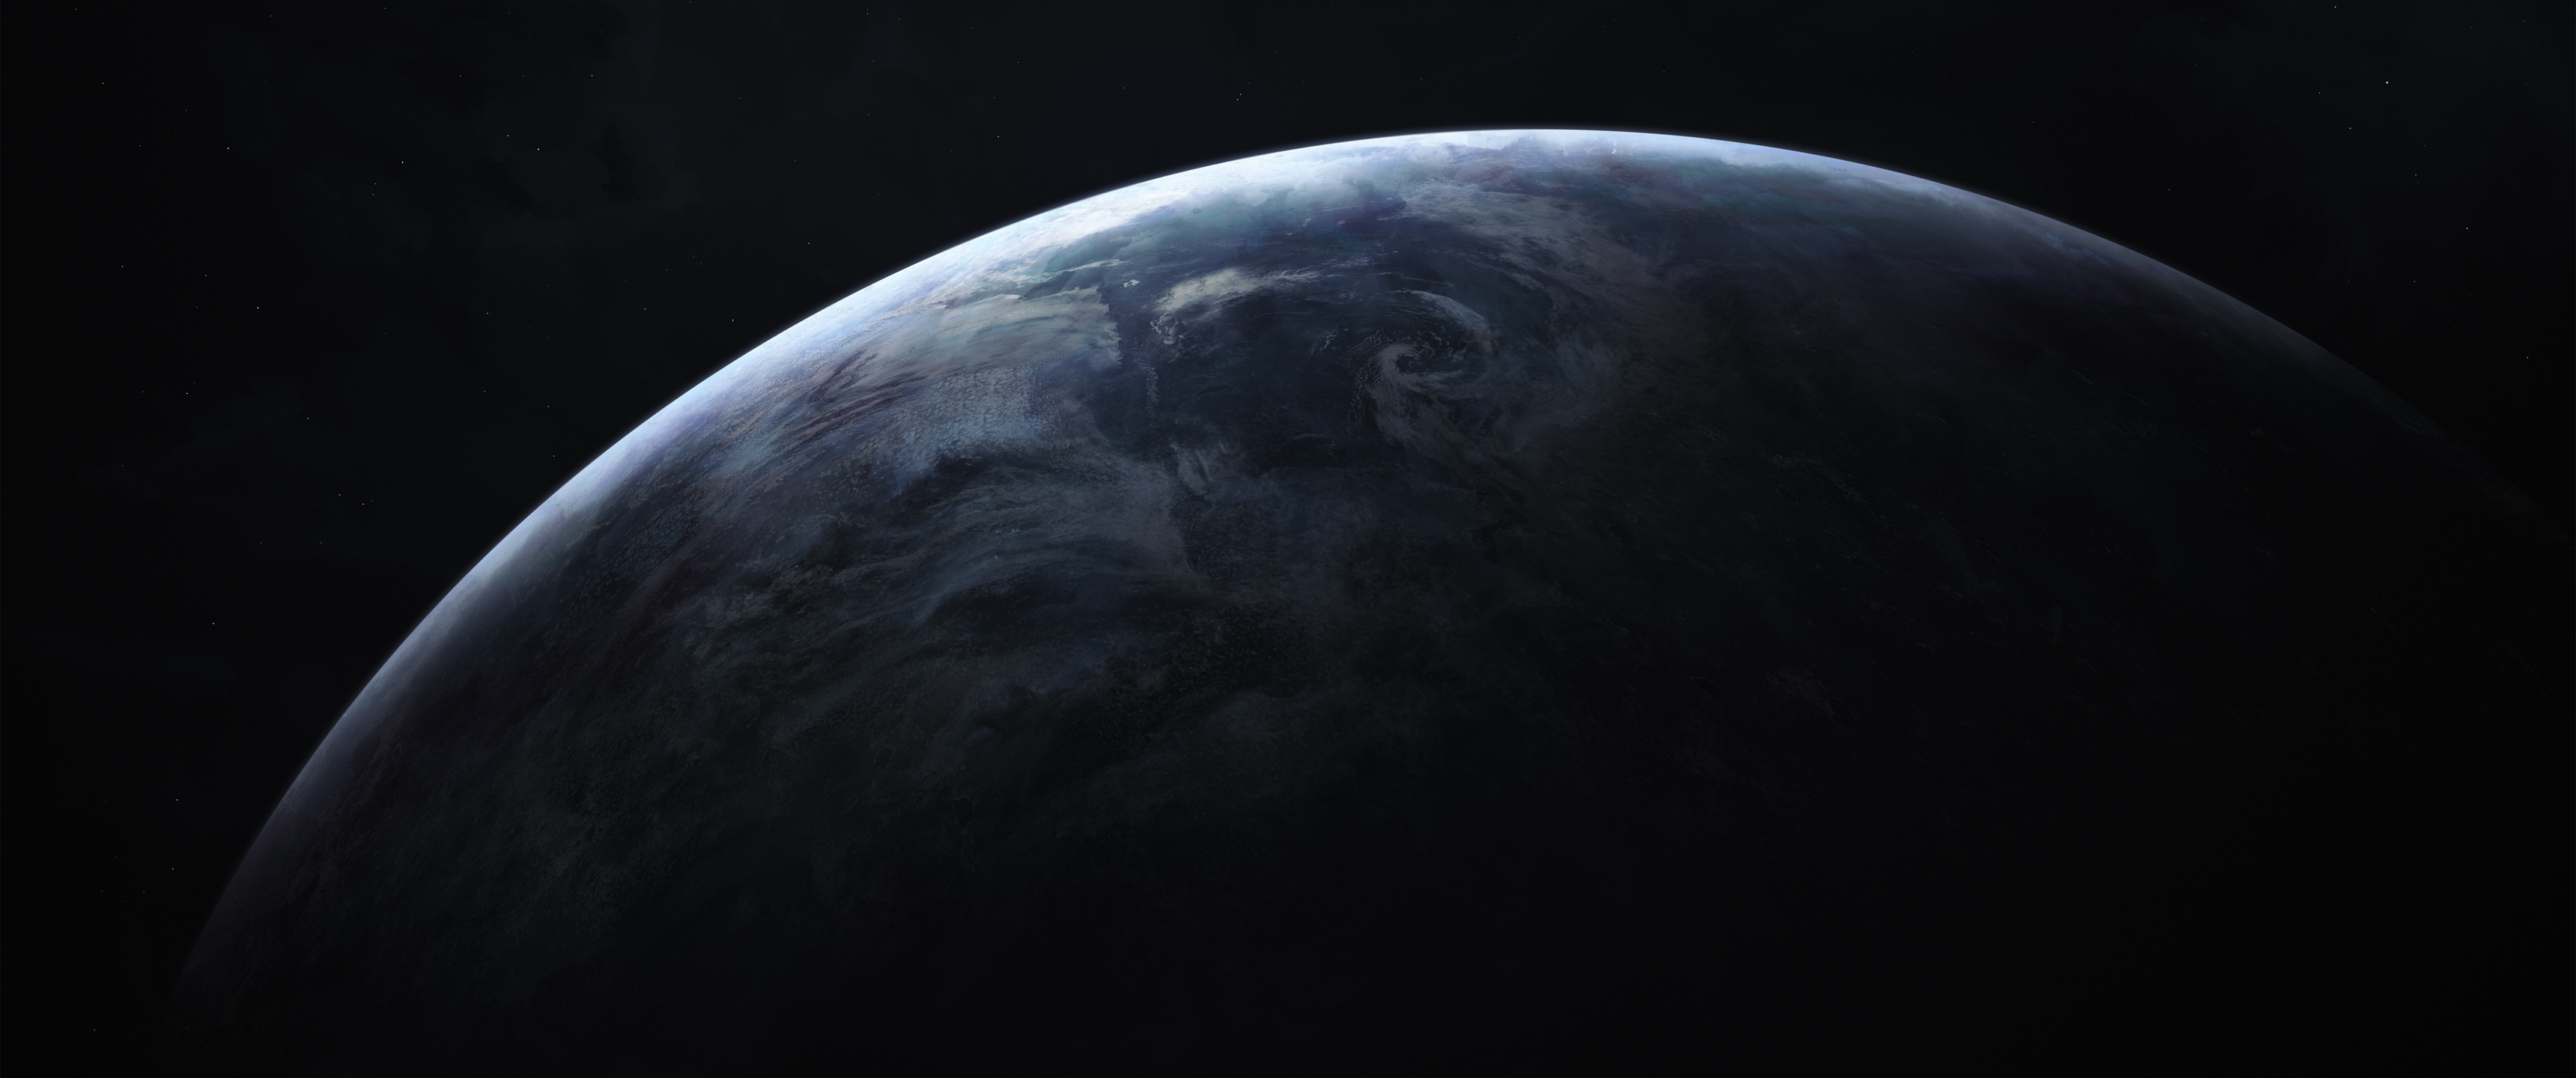 General 3440x1440 ultrawide space space art planet digital art